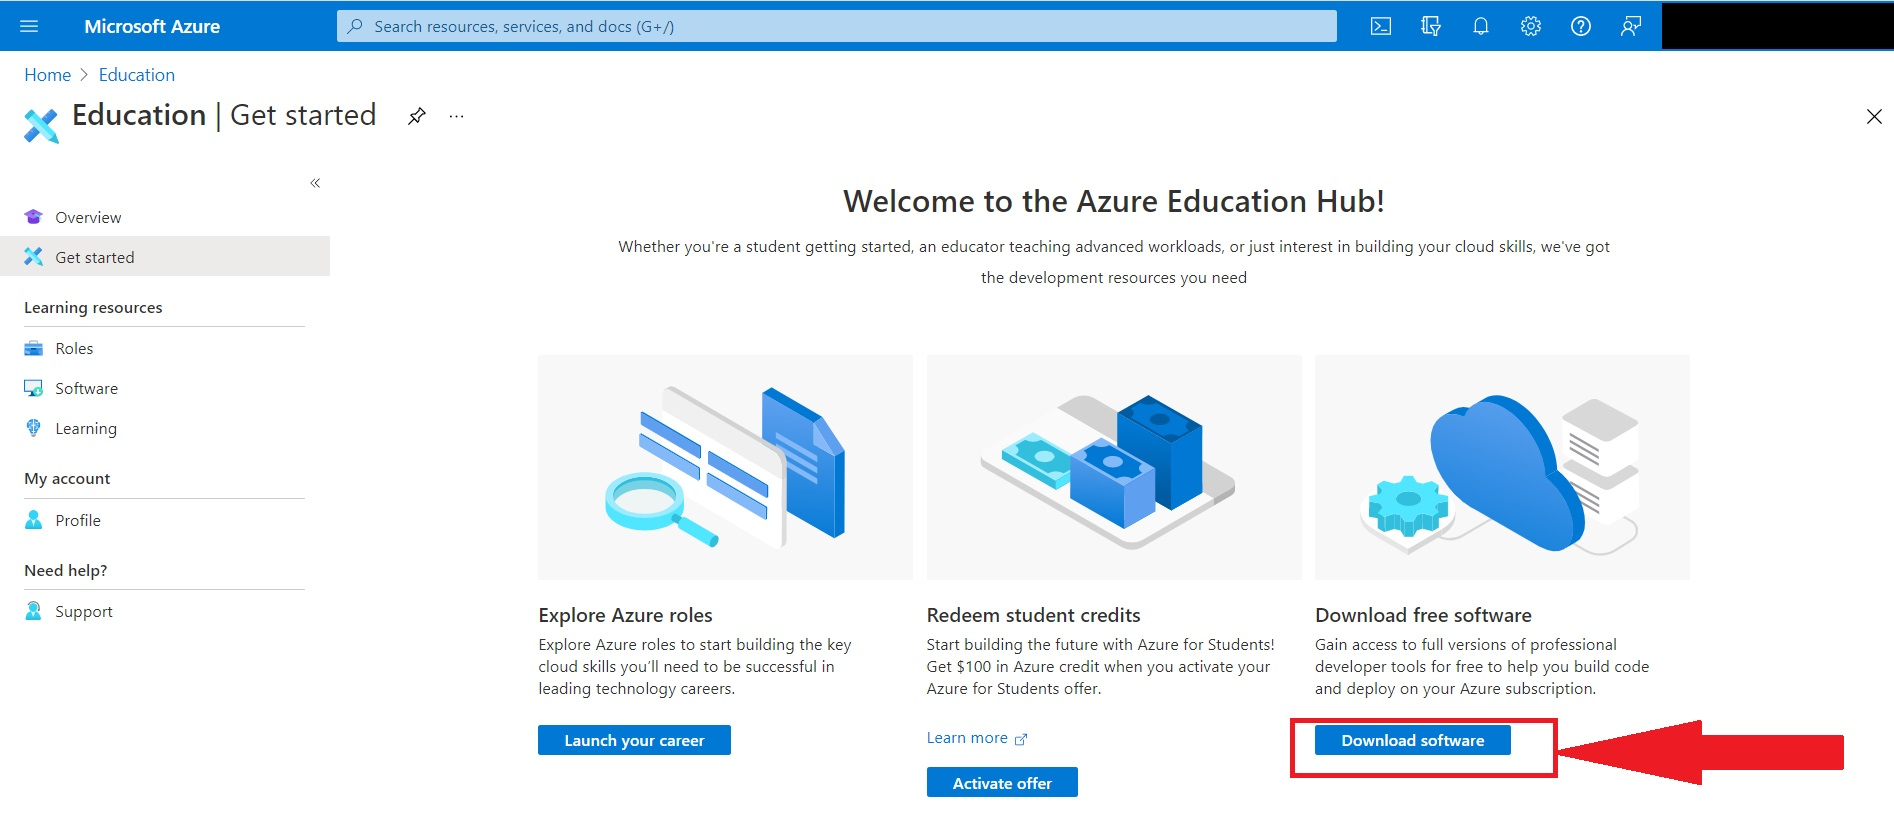 Azure Education Hub